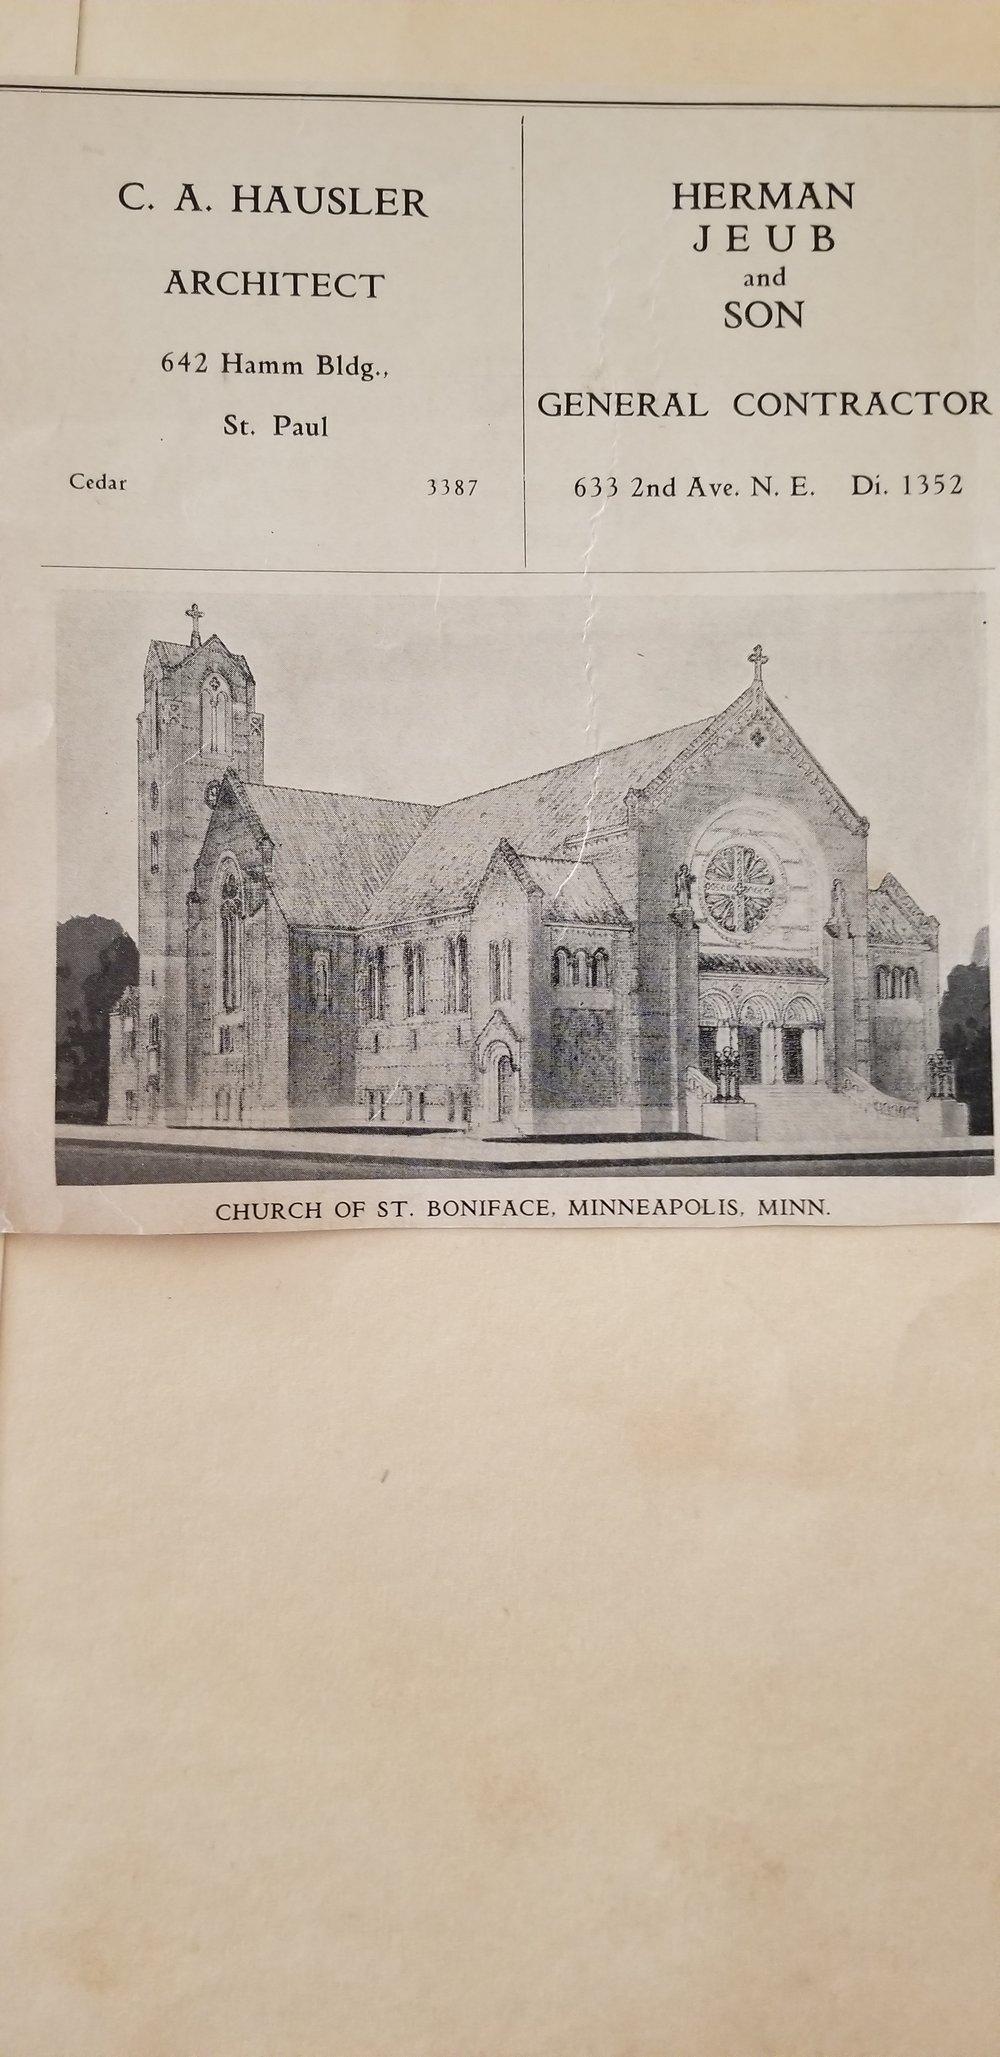 Church of St. Boniface